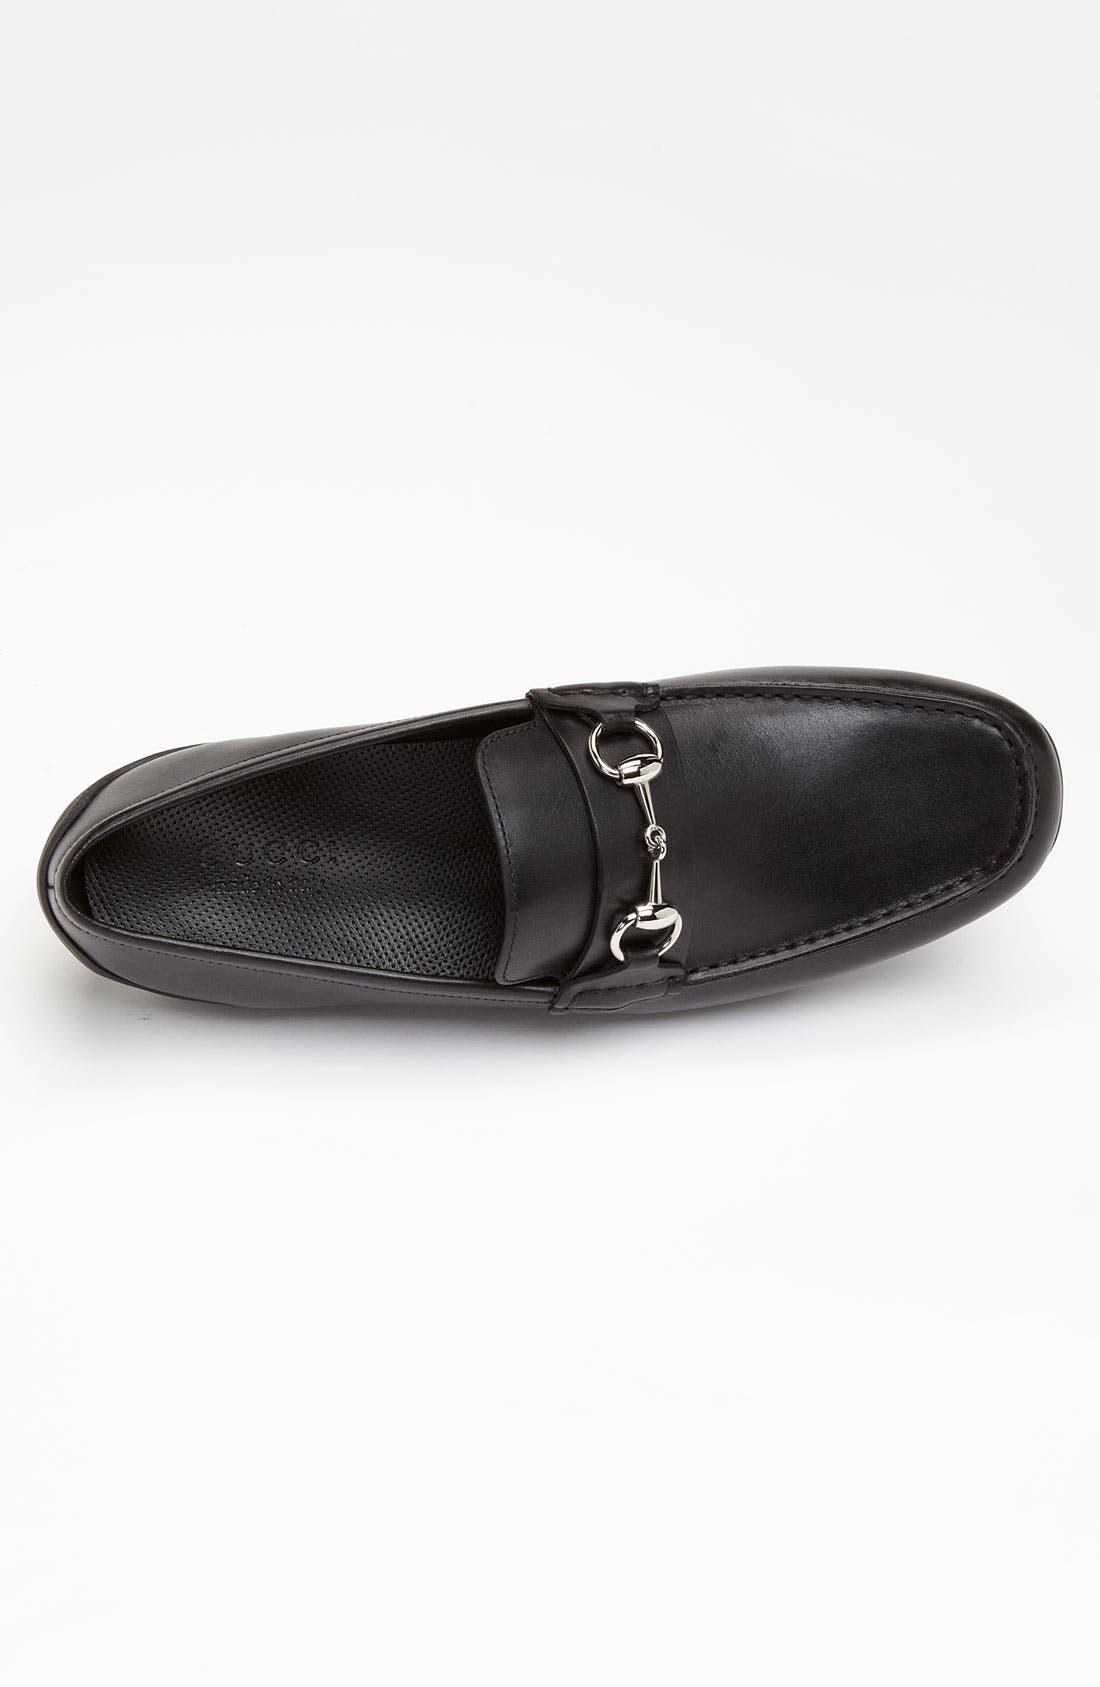 Alternate Image 3  - Gucci 'Silverstone' Moccasin Loafer